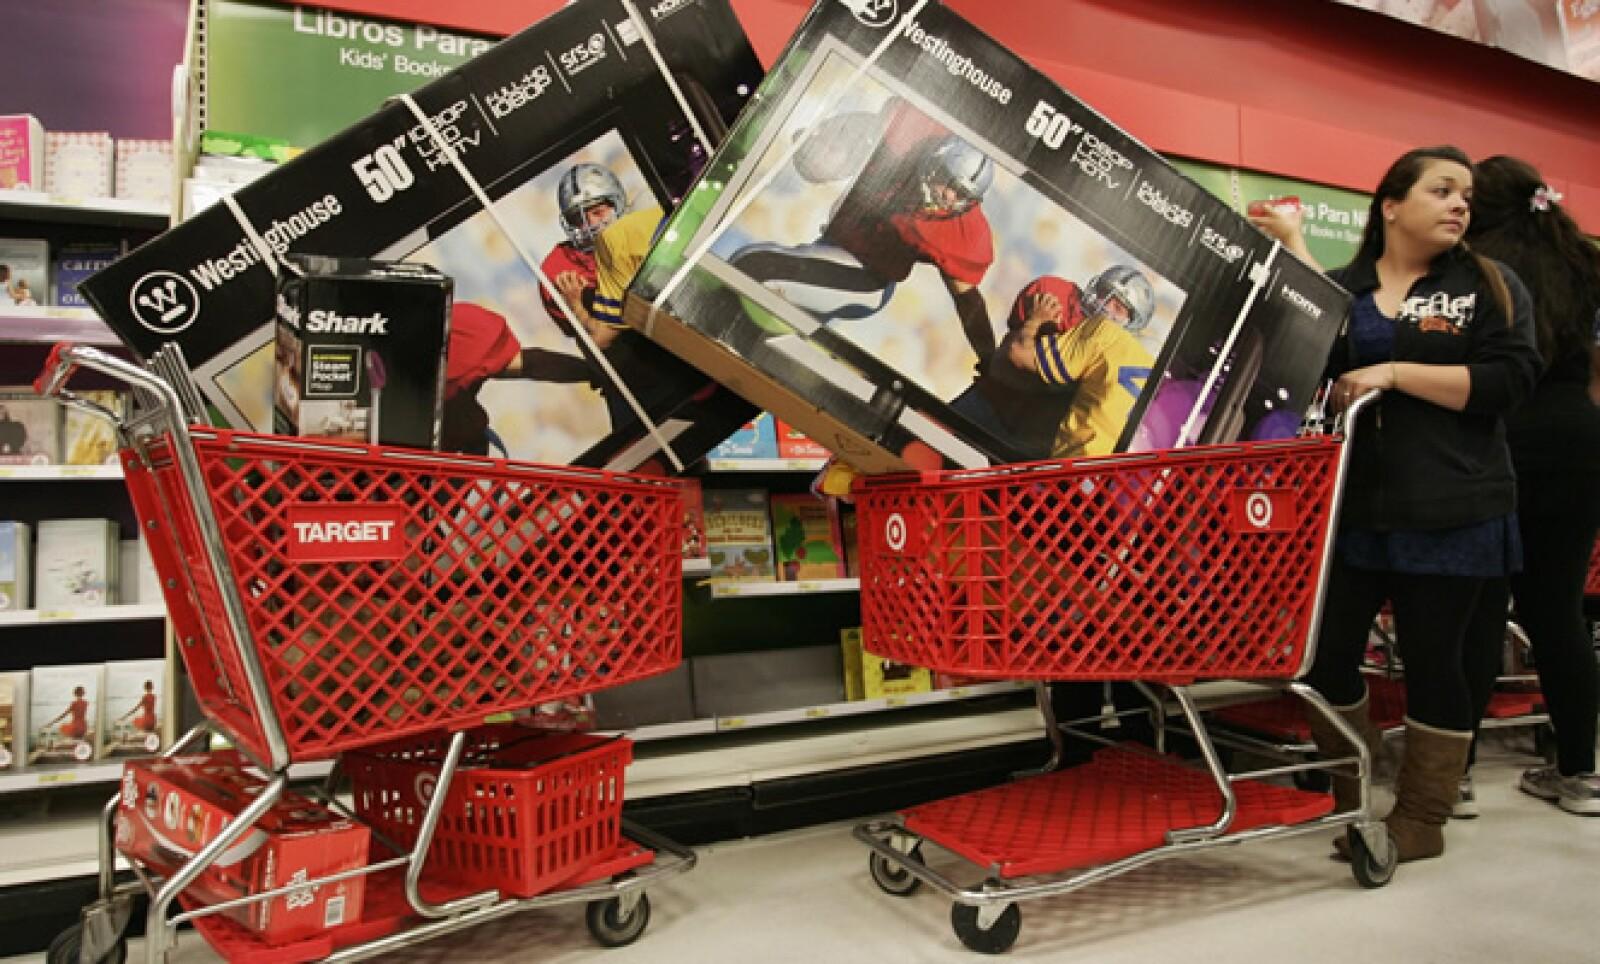 Se calcula que las ventas del Black Friday aumentarán este año 3.8%, a 11,400 millones de dólares, según International Council of Shopping Centers-Goldman Sachs.